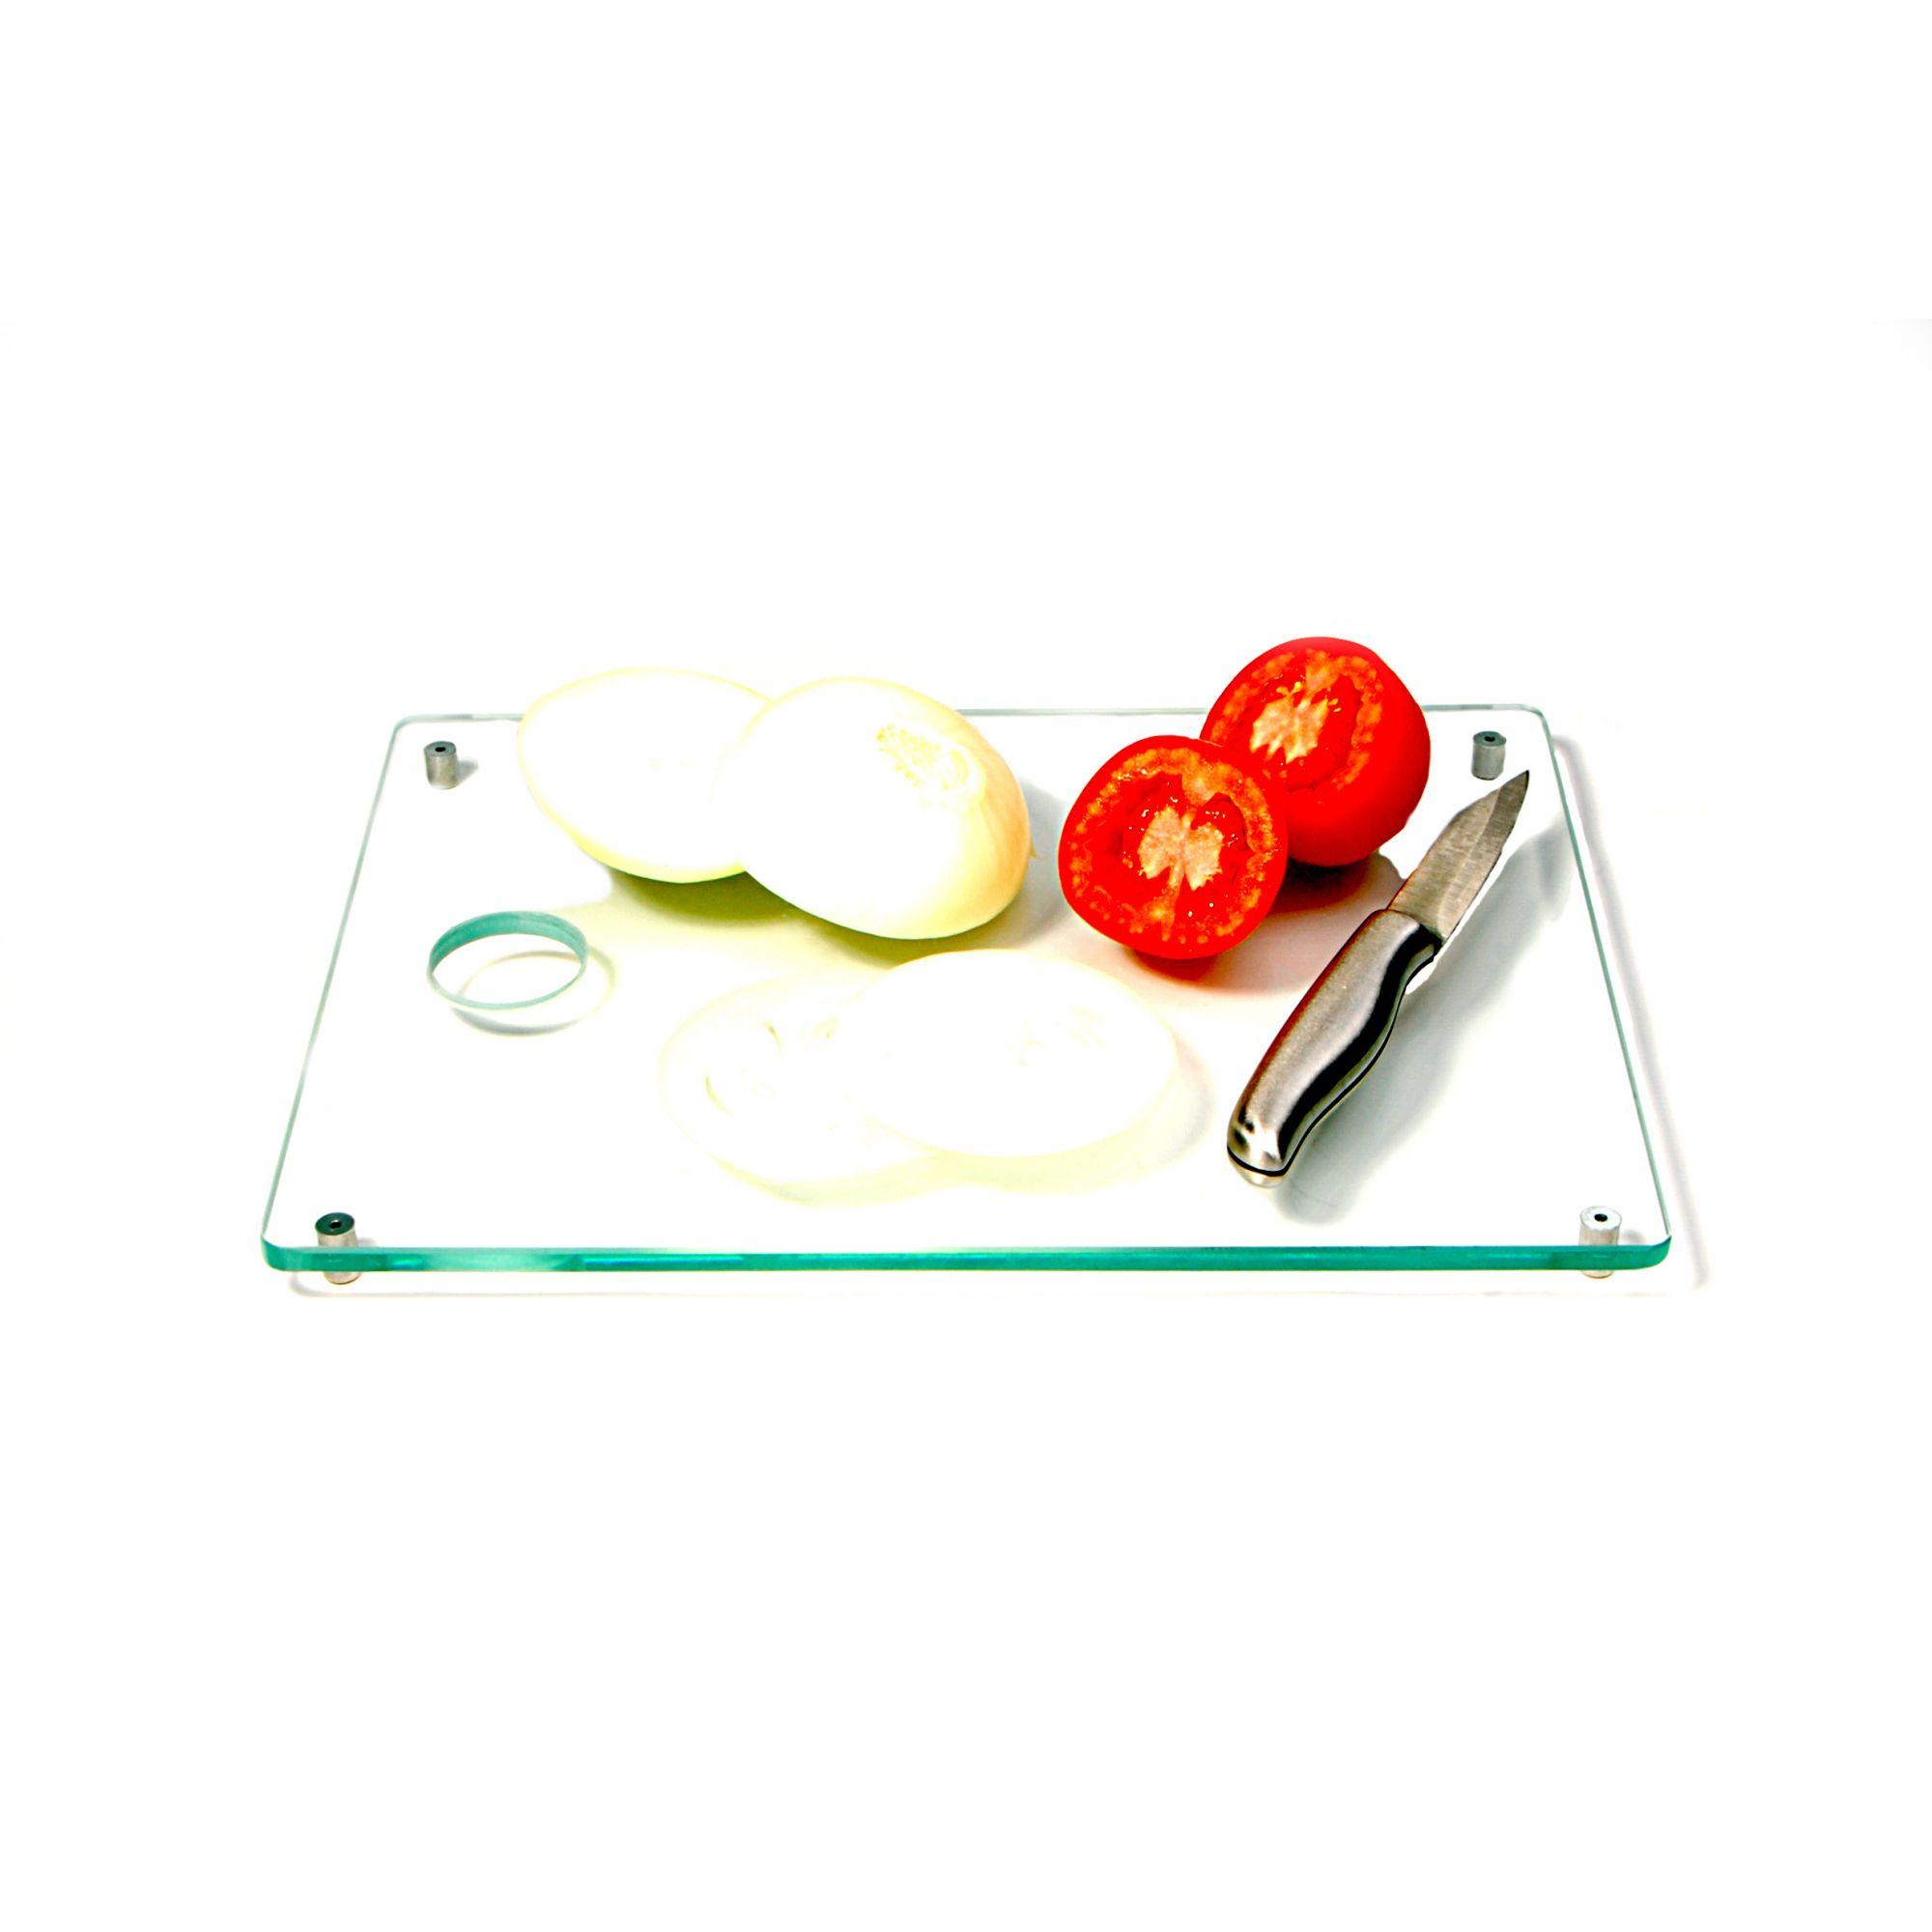 Tábua de carne e legumes média incolor 8mm temperado 35cmx25cm Aquabox